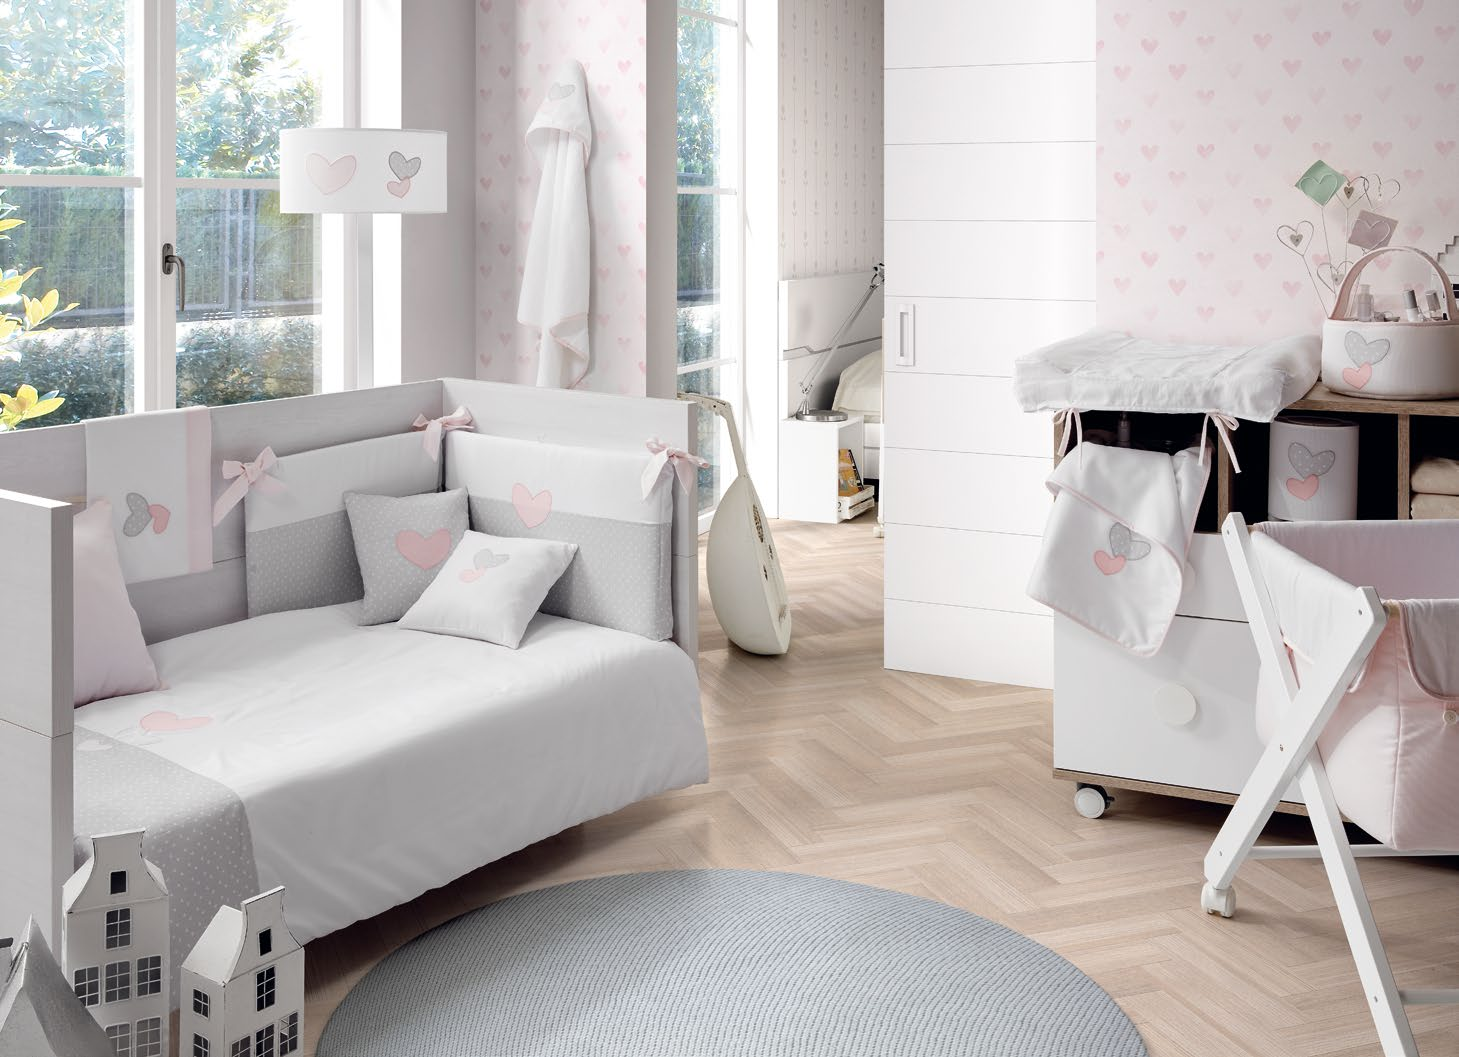 Mueble infantil y textil de calidad en teruel